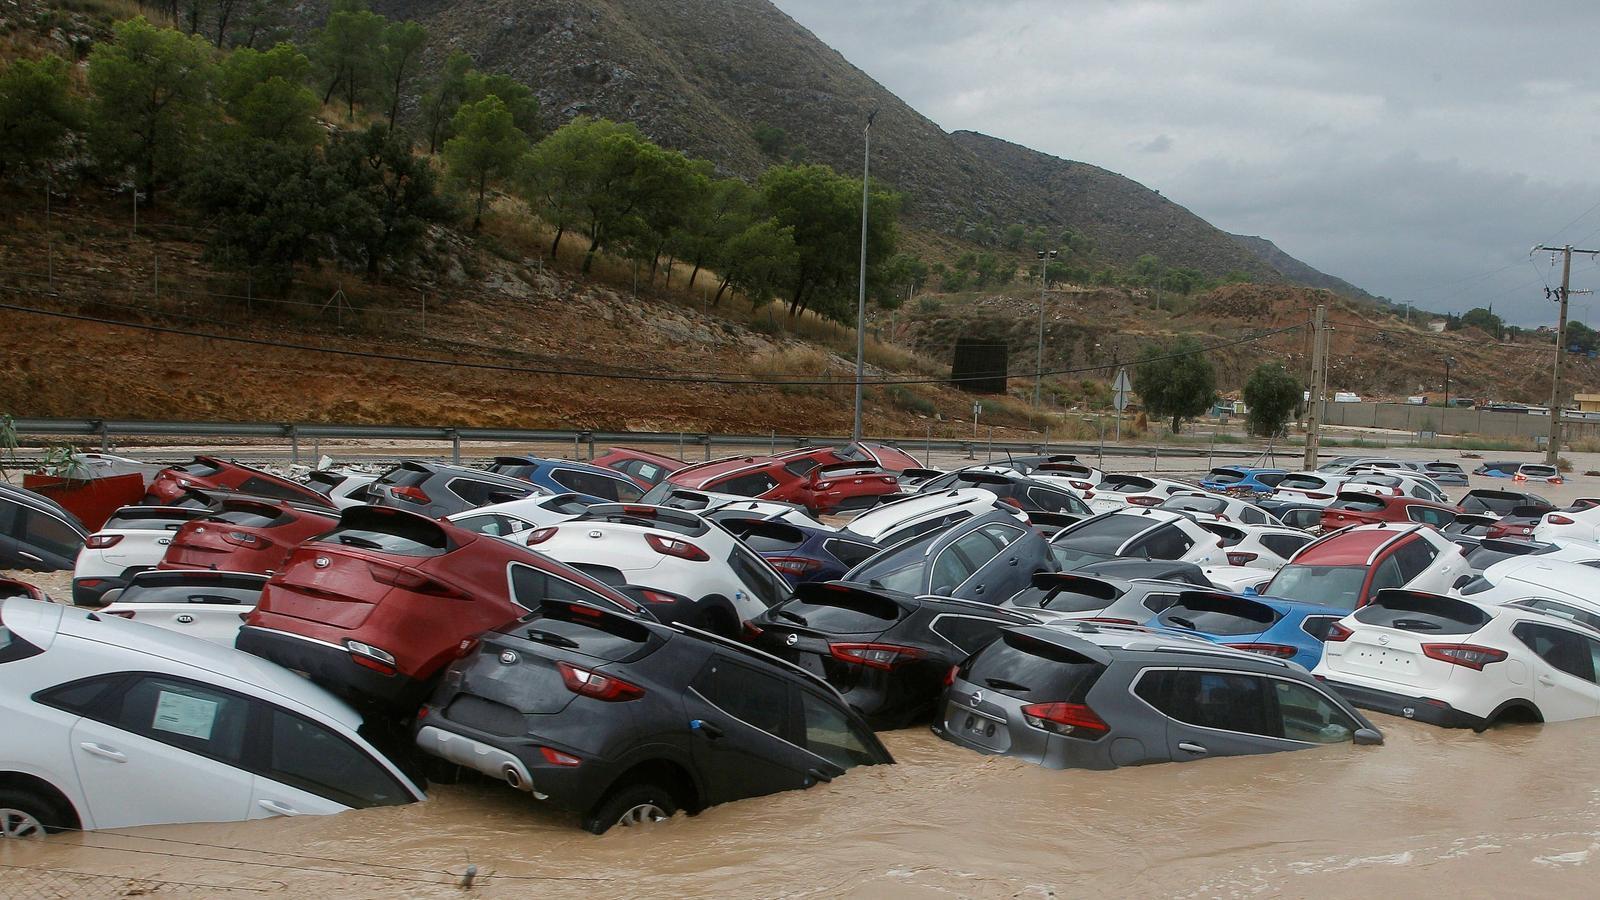 Temporal històric de pluja que desborda rius al País Valencià i causa dos morts a Albacete